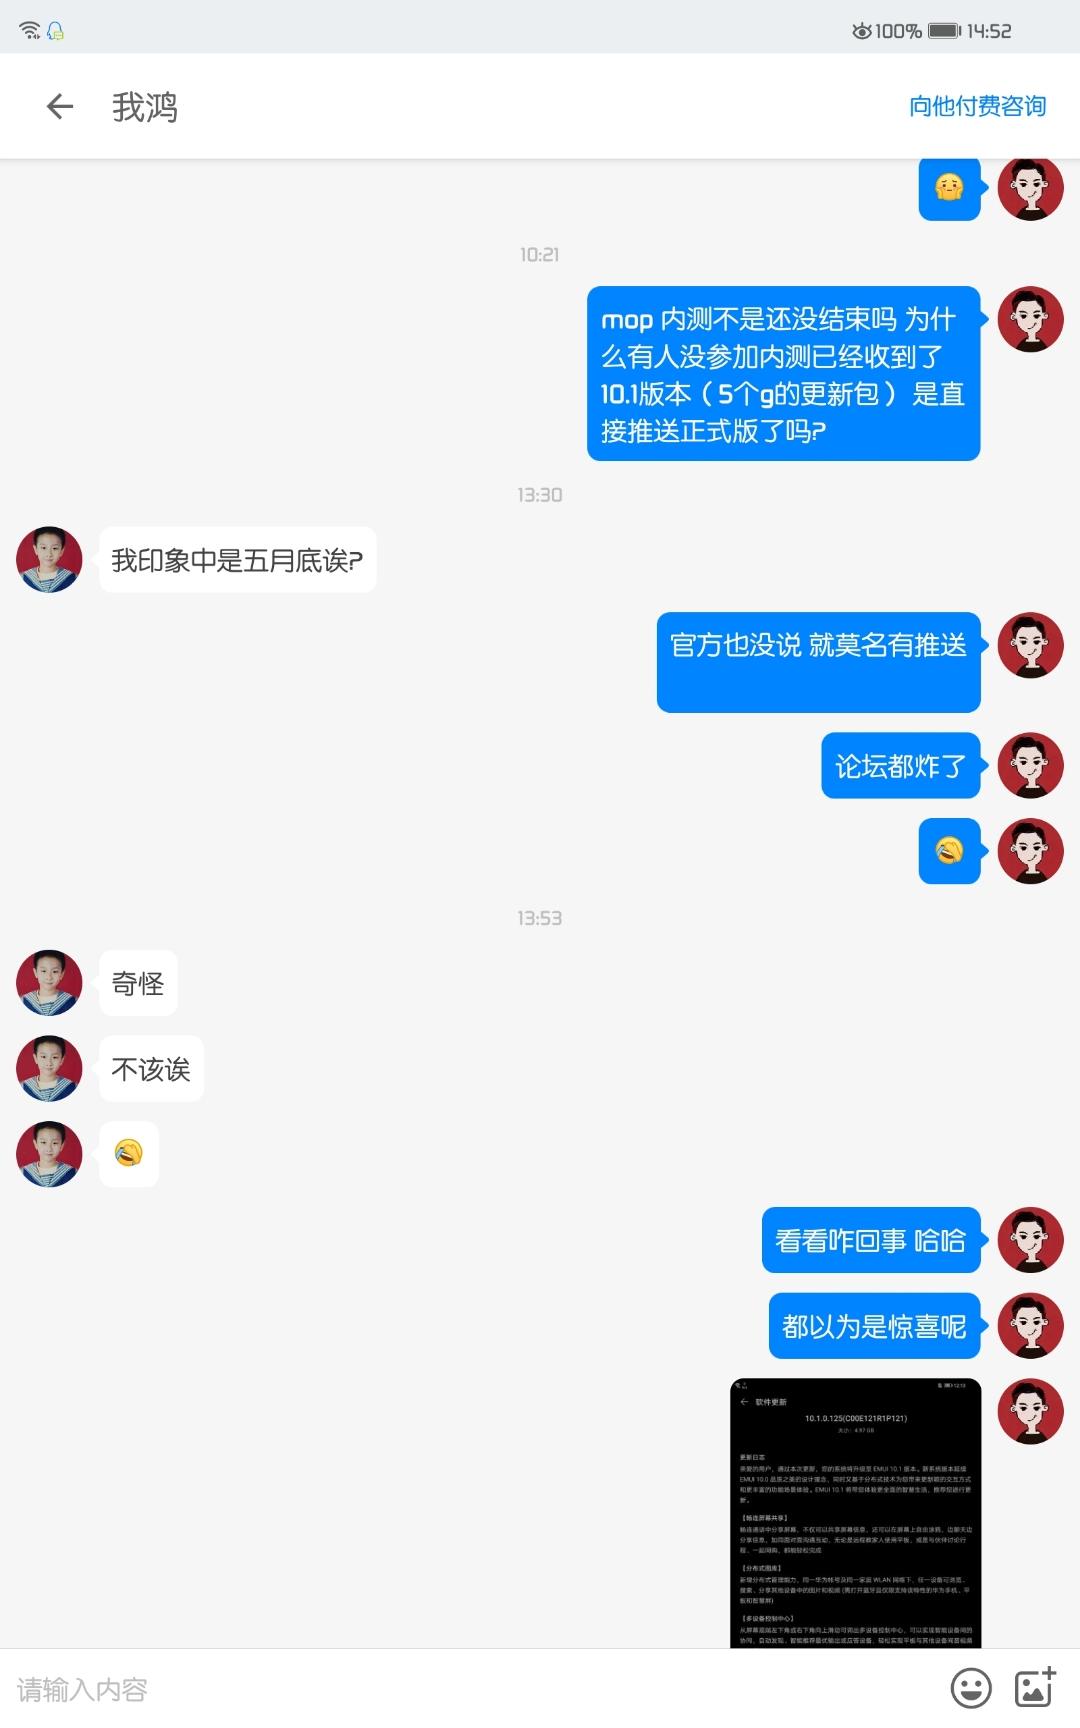 Screenshot_20200515_145239_com.zhihu.android.jpg